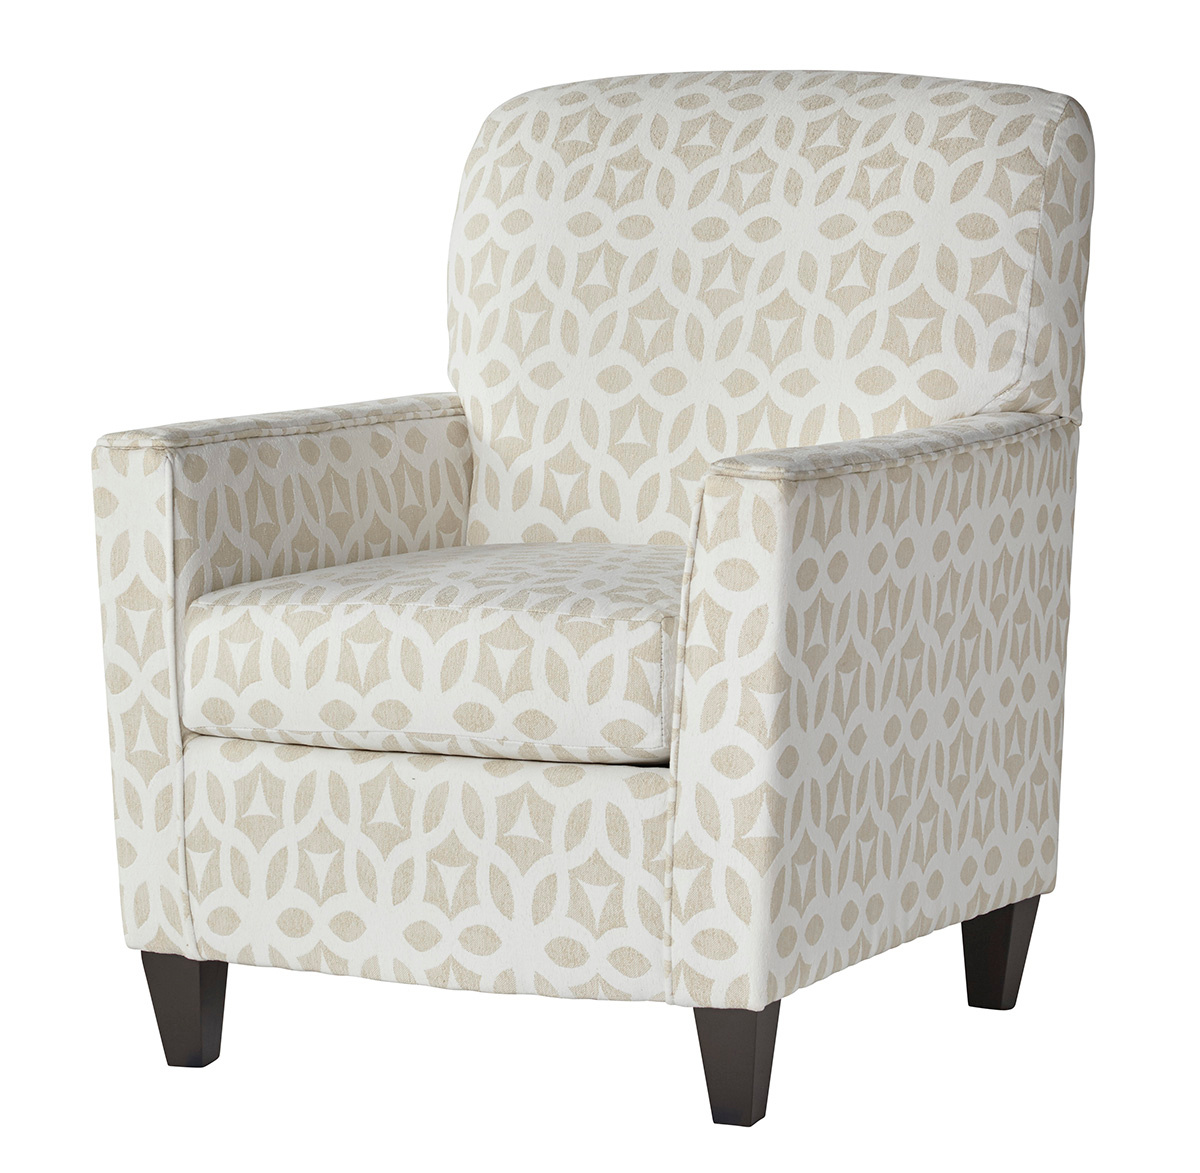 35FOVA Serta Accent Chair